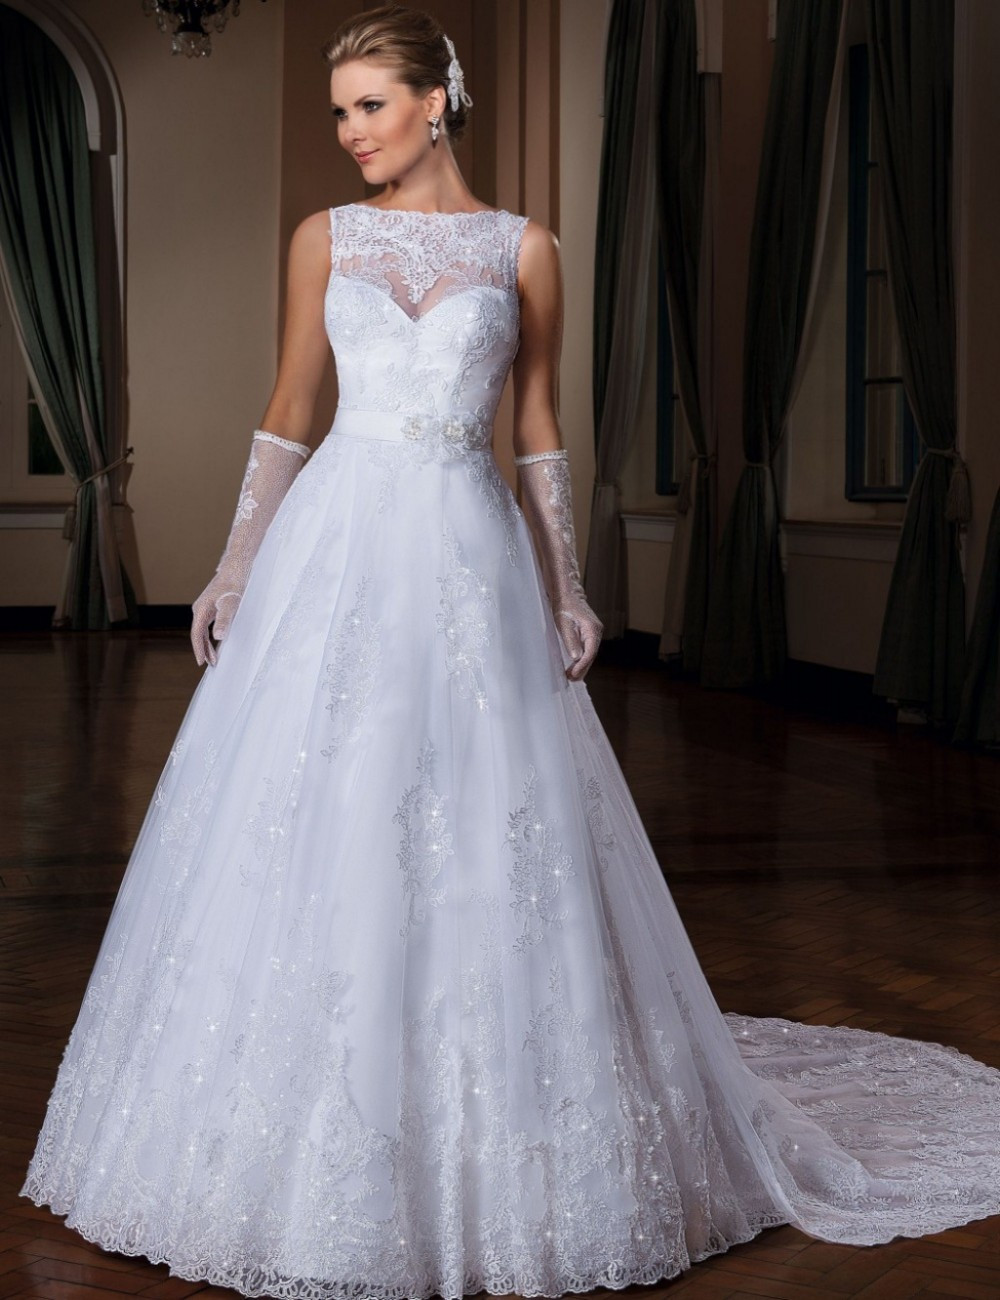 aliexpress com buy new arrival lace mermaid wedding dresses 2016 sweetheart beaded vestido de noiva sereia robe mariage brid - Aliexpress Mariage